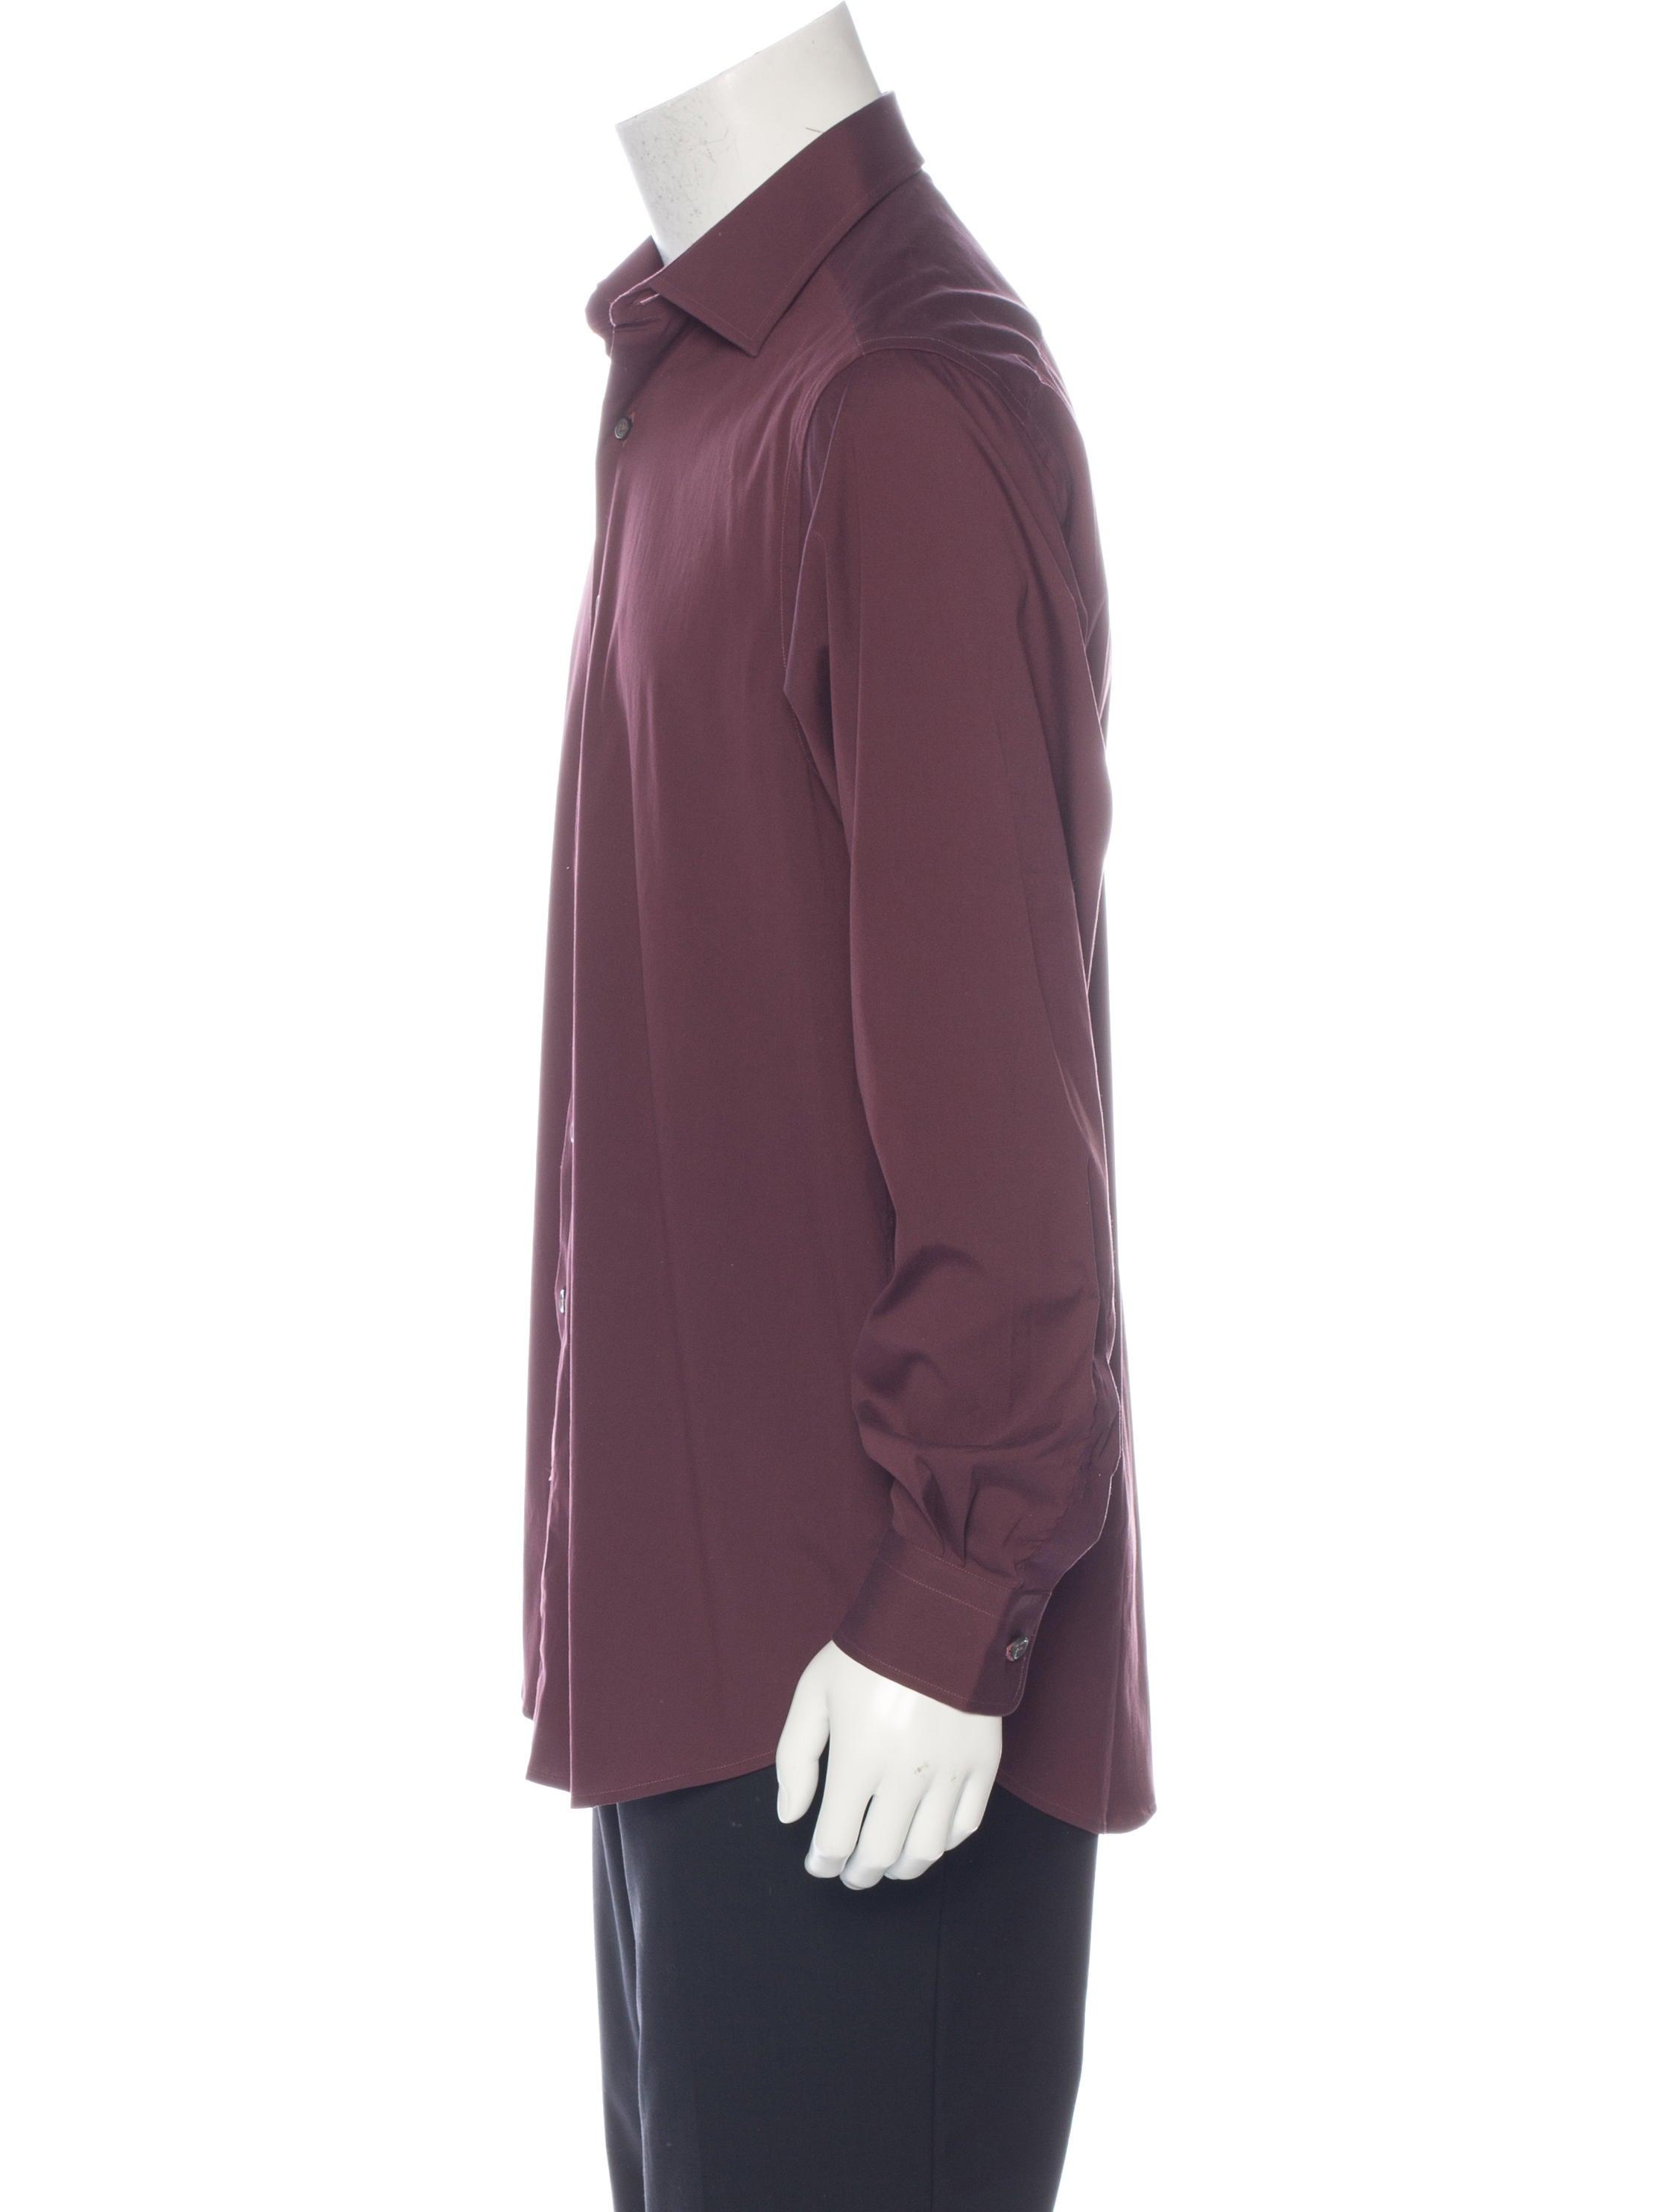 Lorenzini woven dress shirt w tags clothing Woven t shirt tags